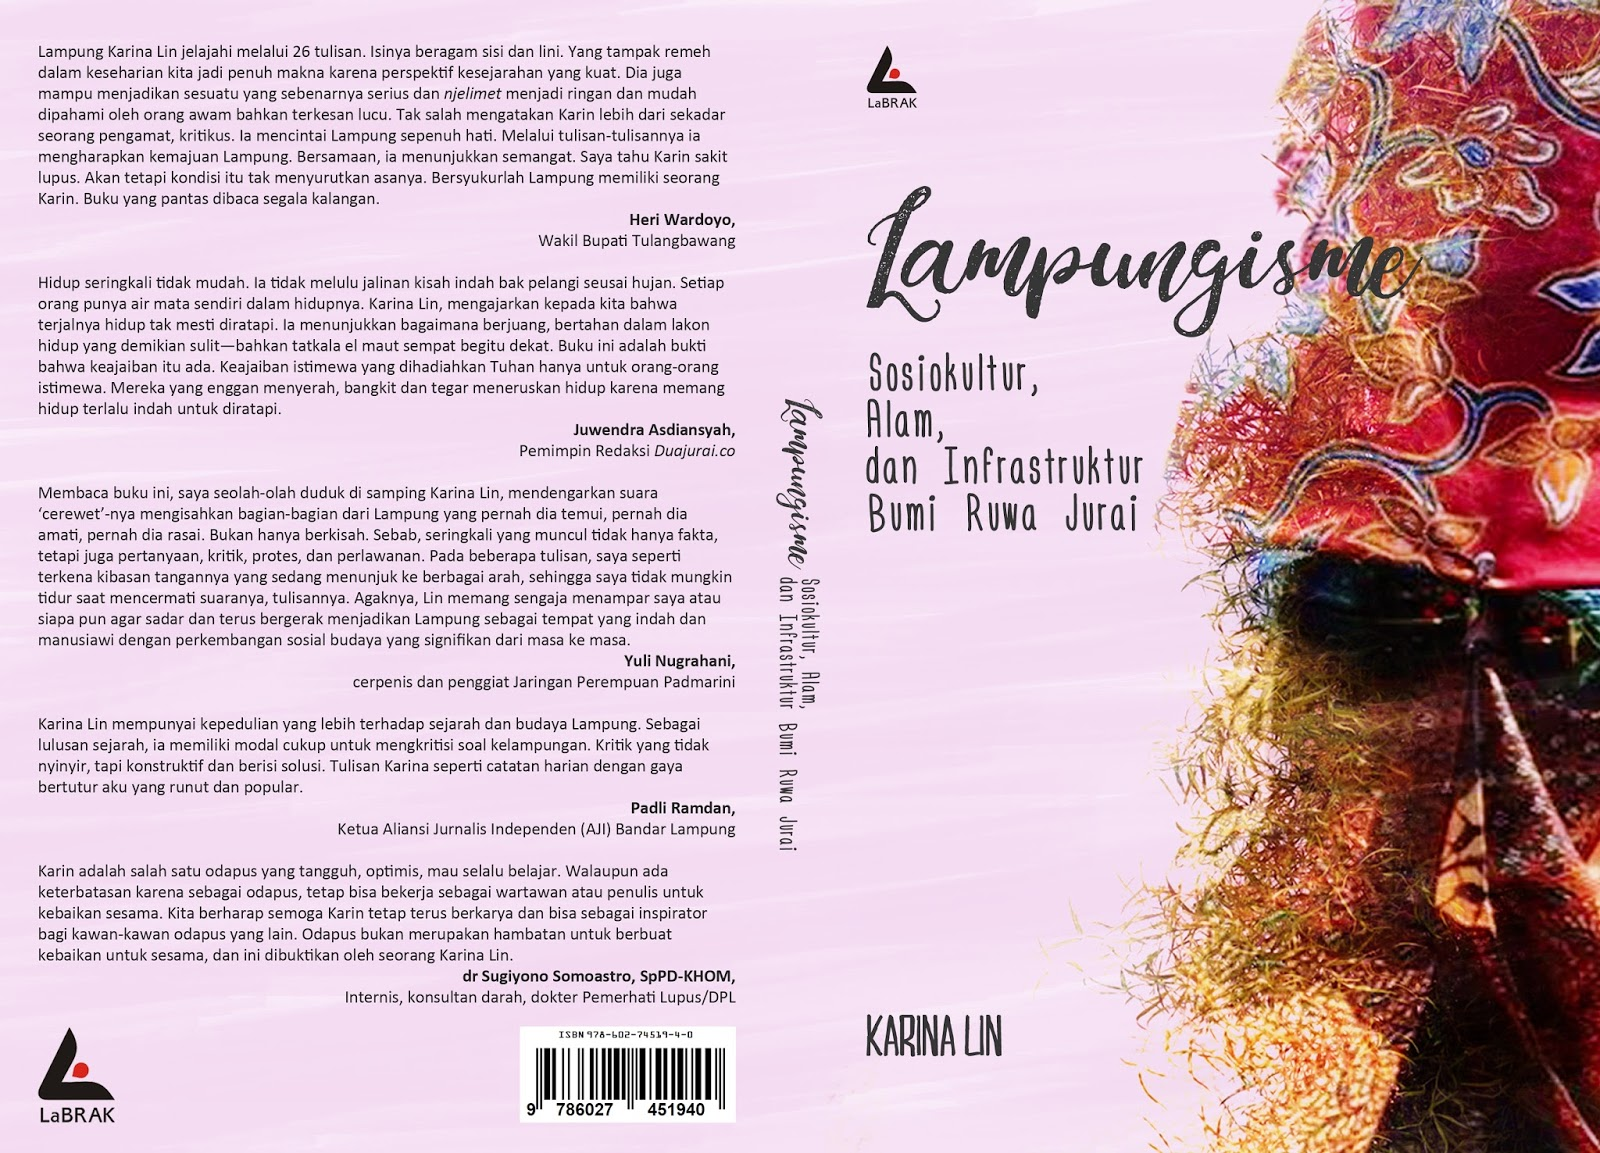 Tokoh Lampung Buku Lampungisme Sosiokultur Alam Infrastruktur Bumi Ruwa Jurai